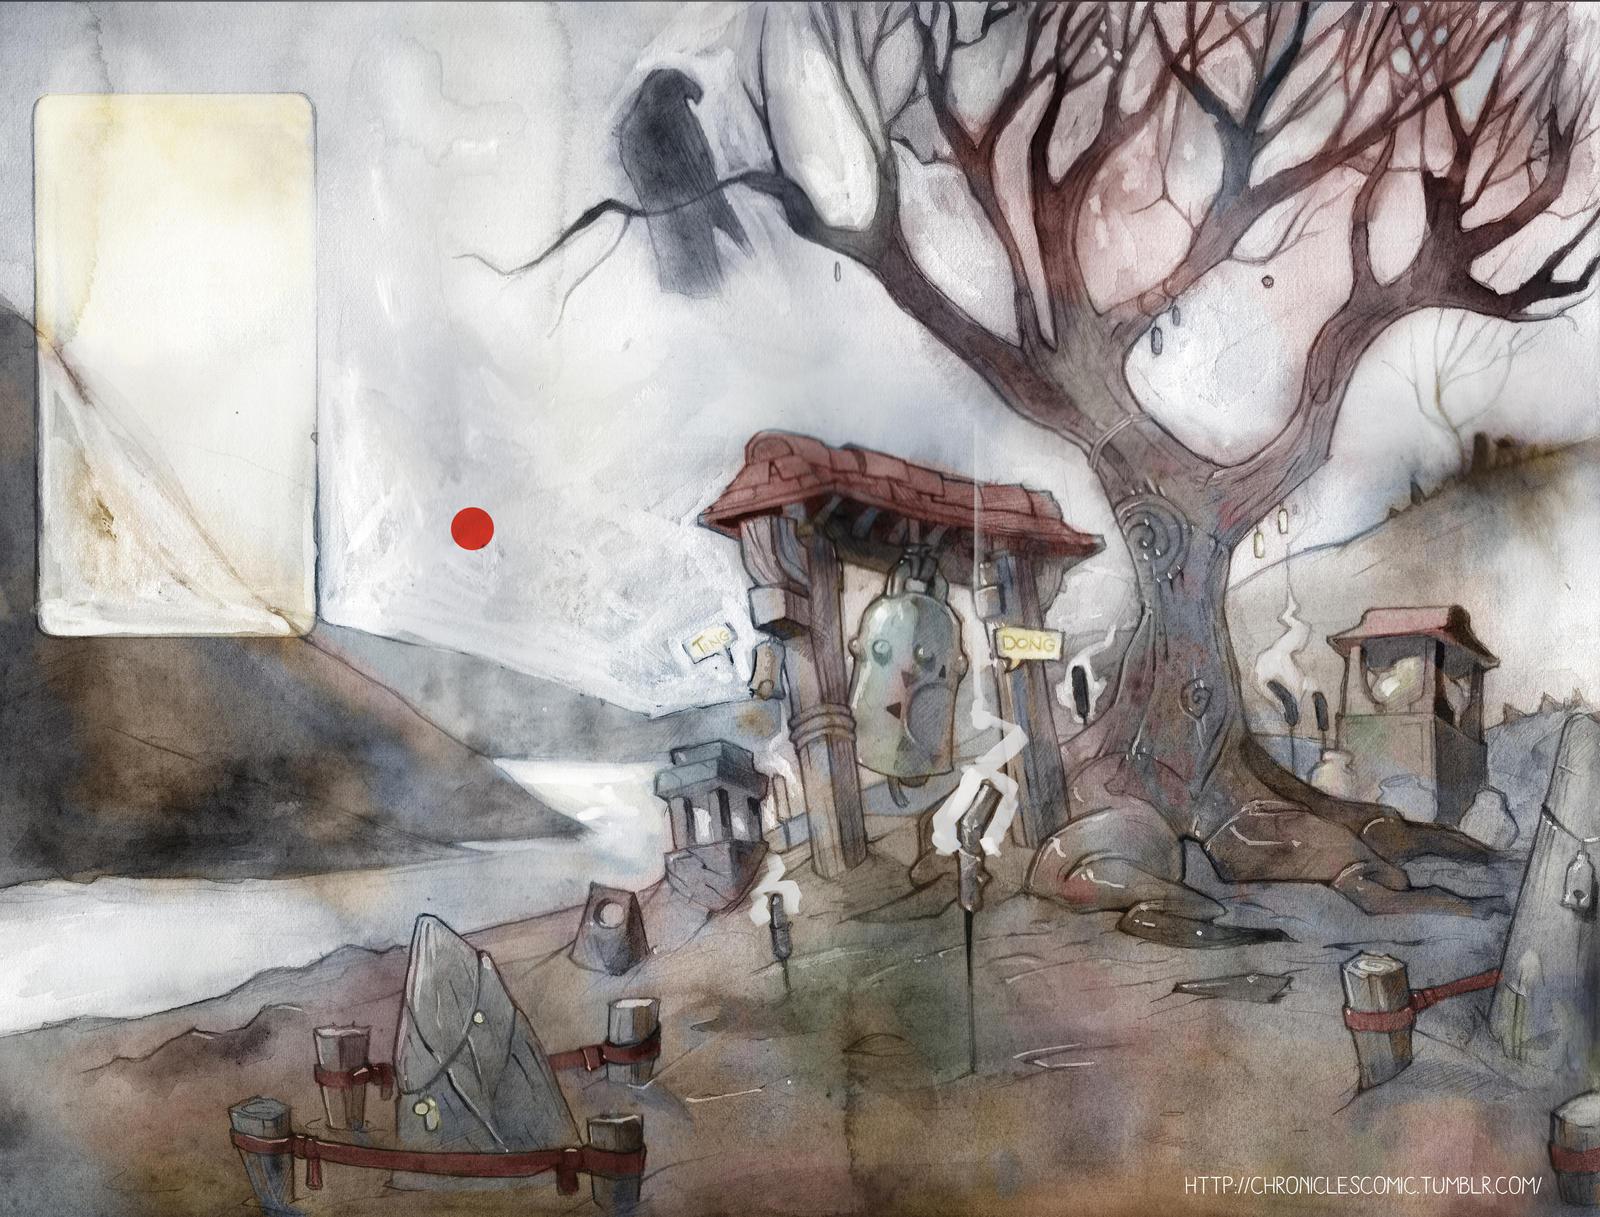 Shrine by the Loch by clockwerkjos